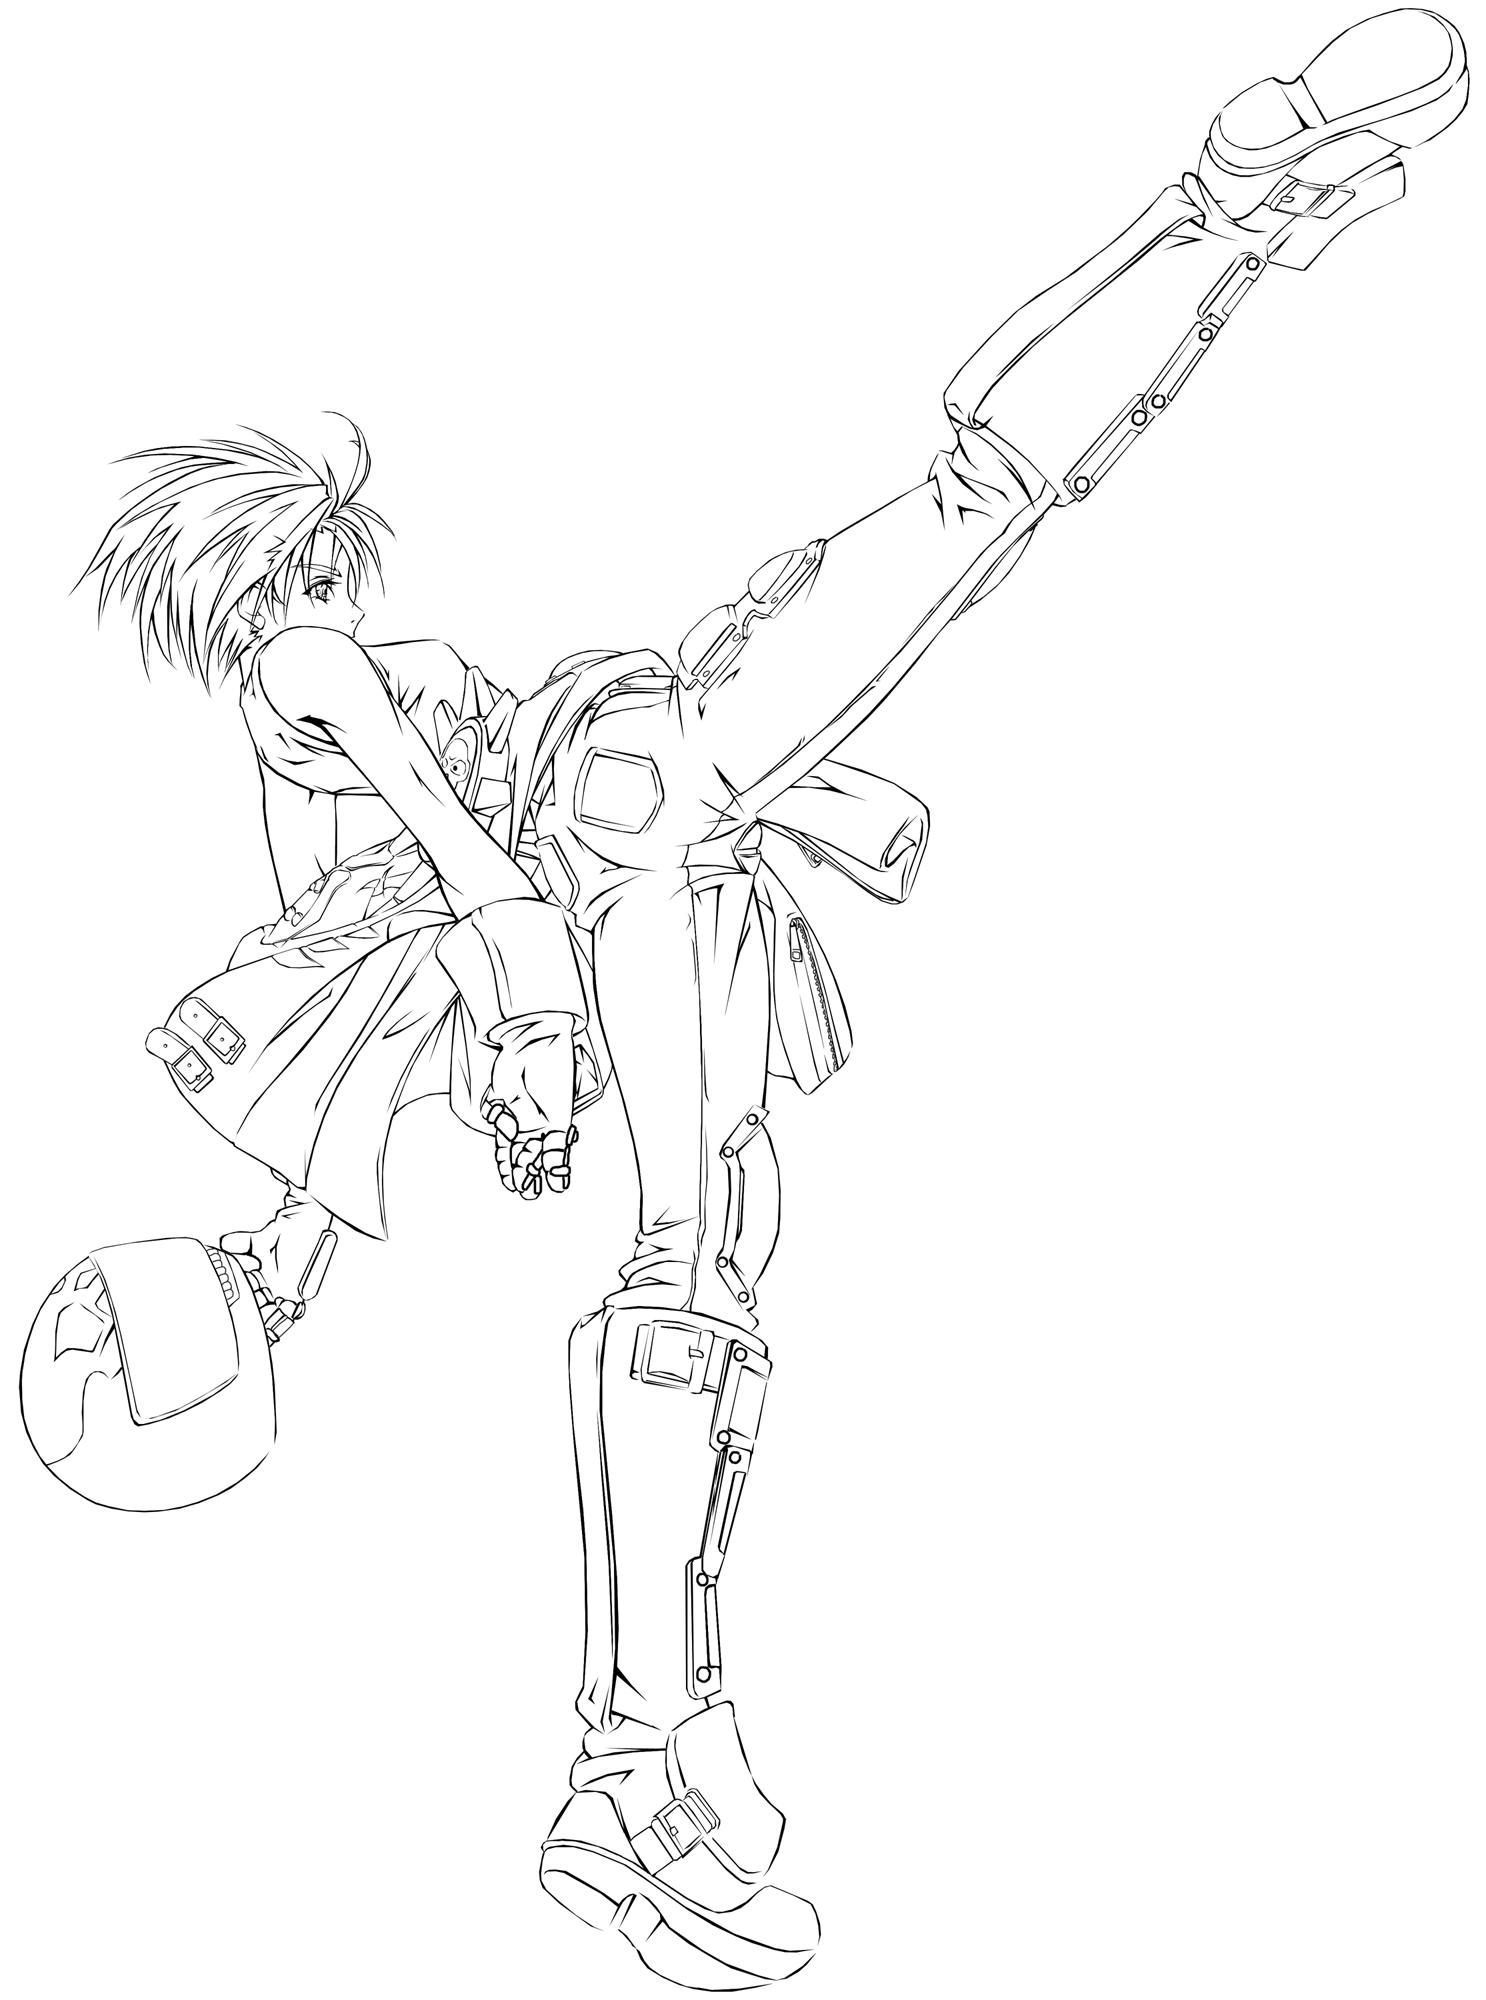 Shina's Journal Akira_kazama_by_agacross-d18qj22